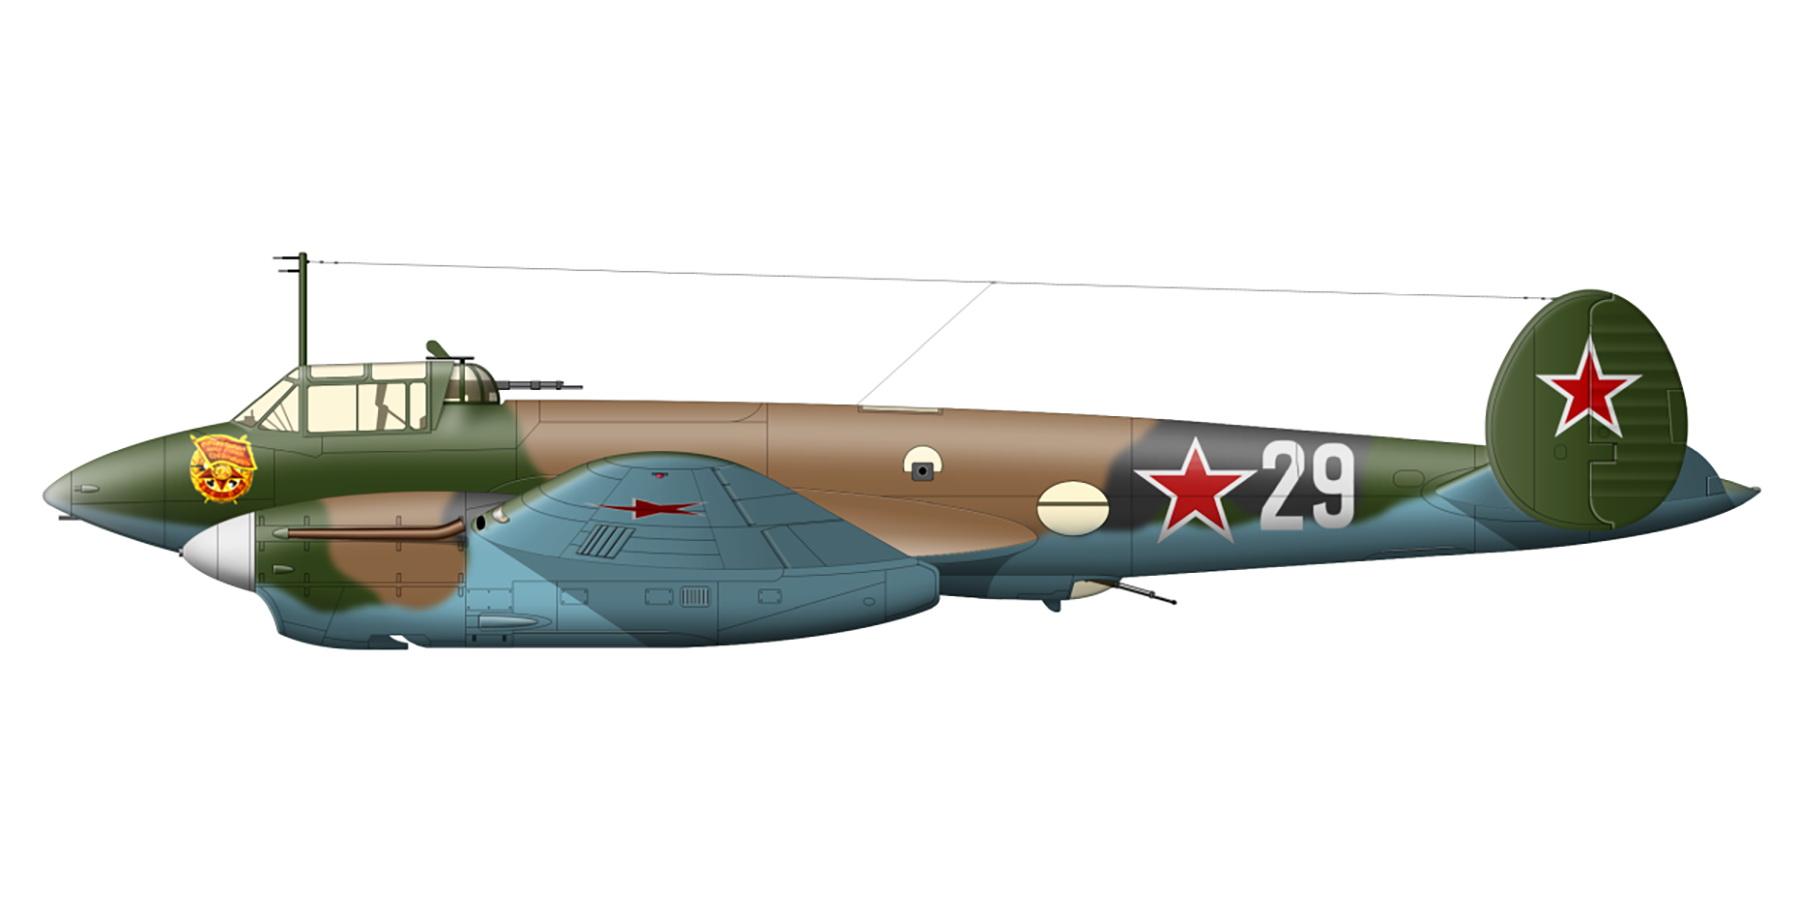 Petlyakov Pe 2 type 110 40GvBAP Black Sea Fleet White 29 Crimea 1944 0A